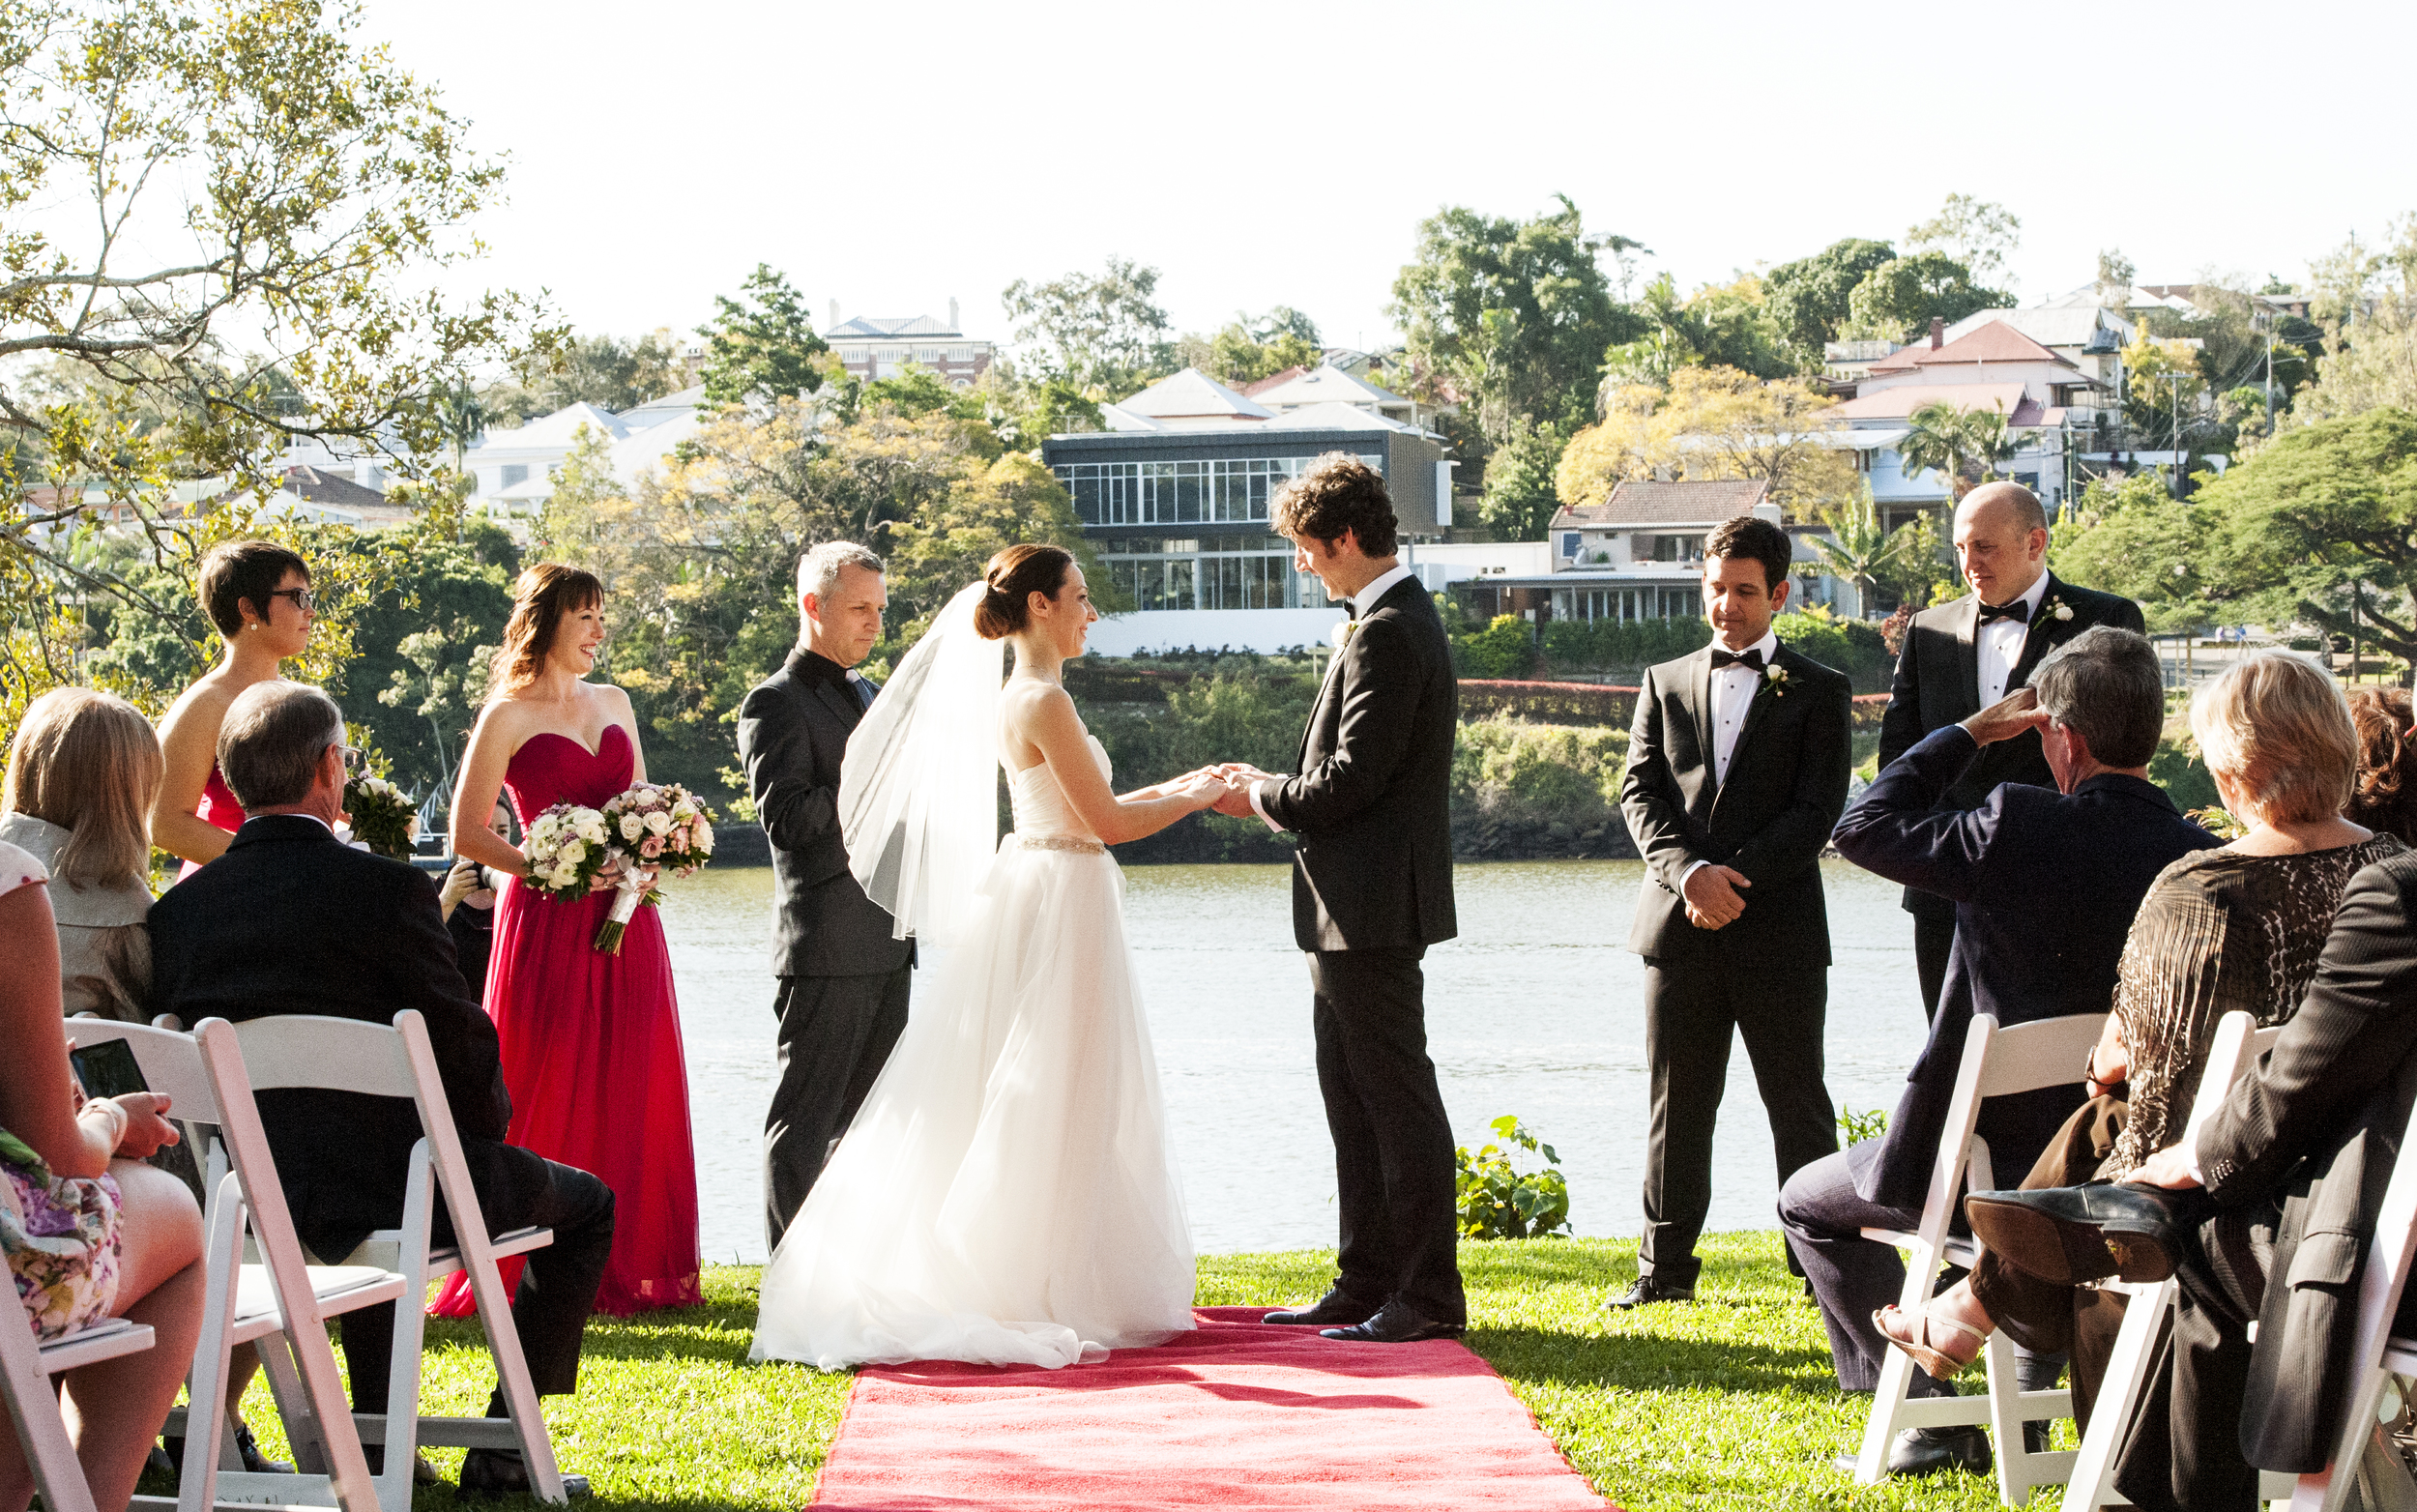 leanne wedding88 (2).jpg